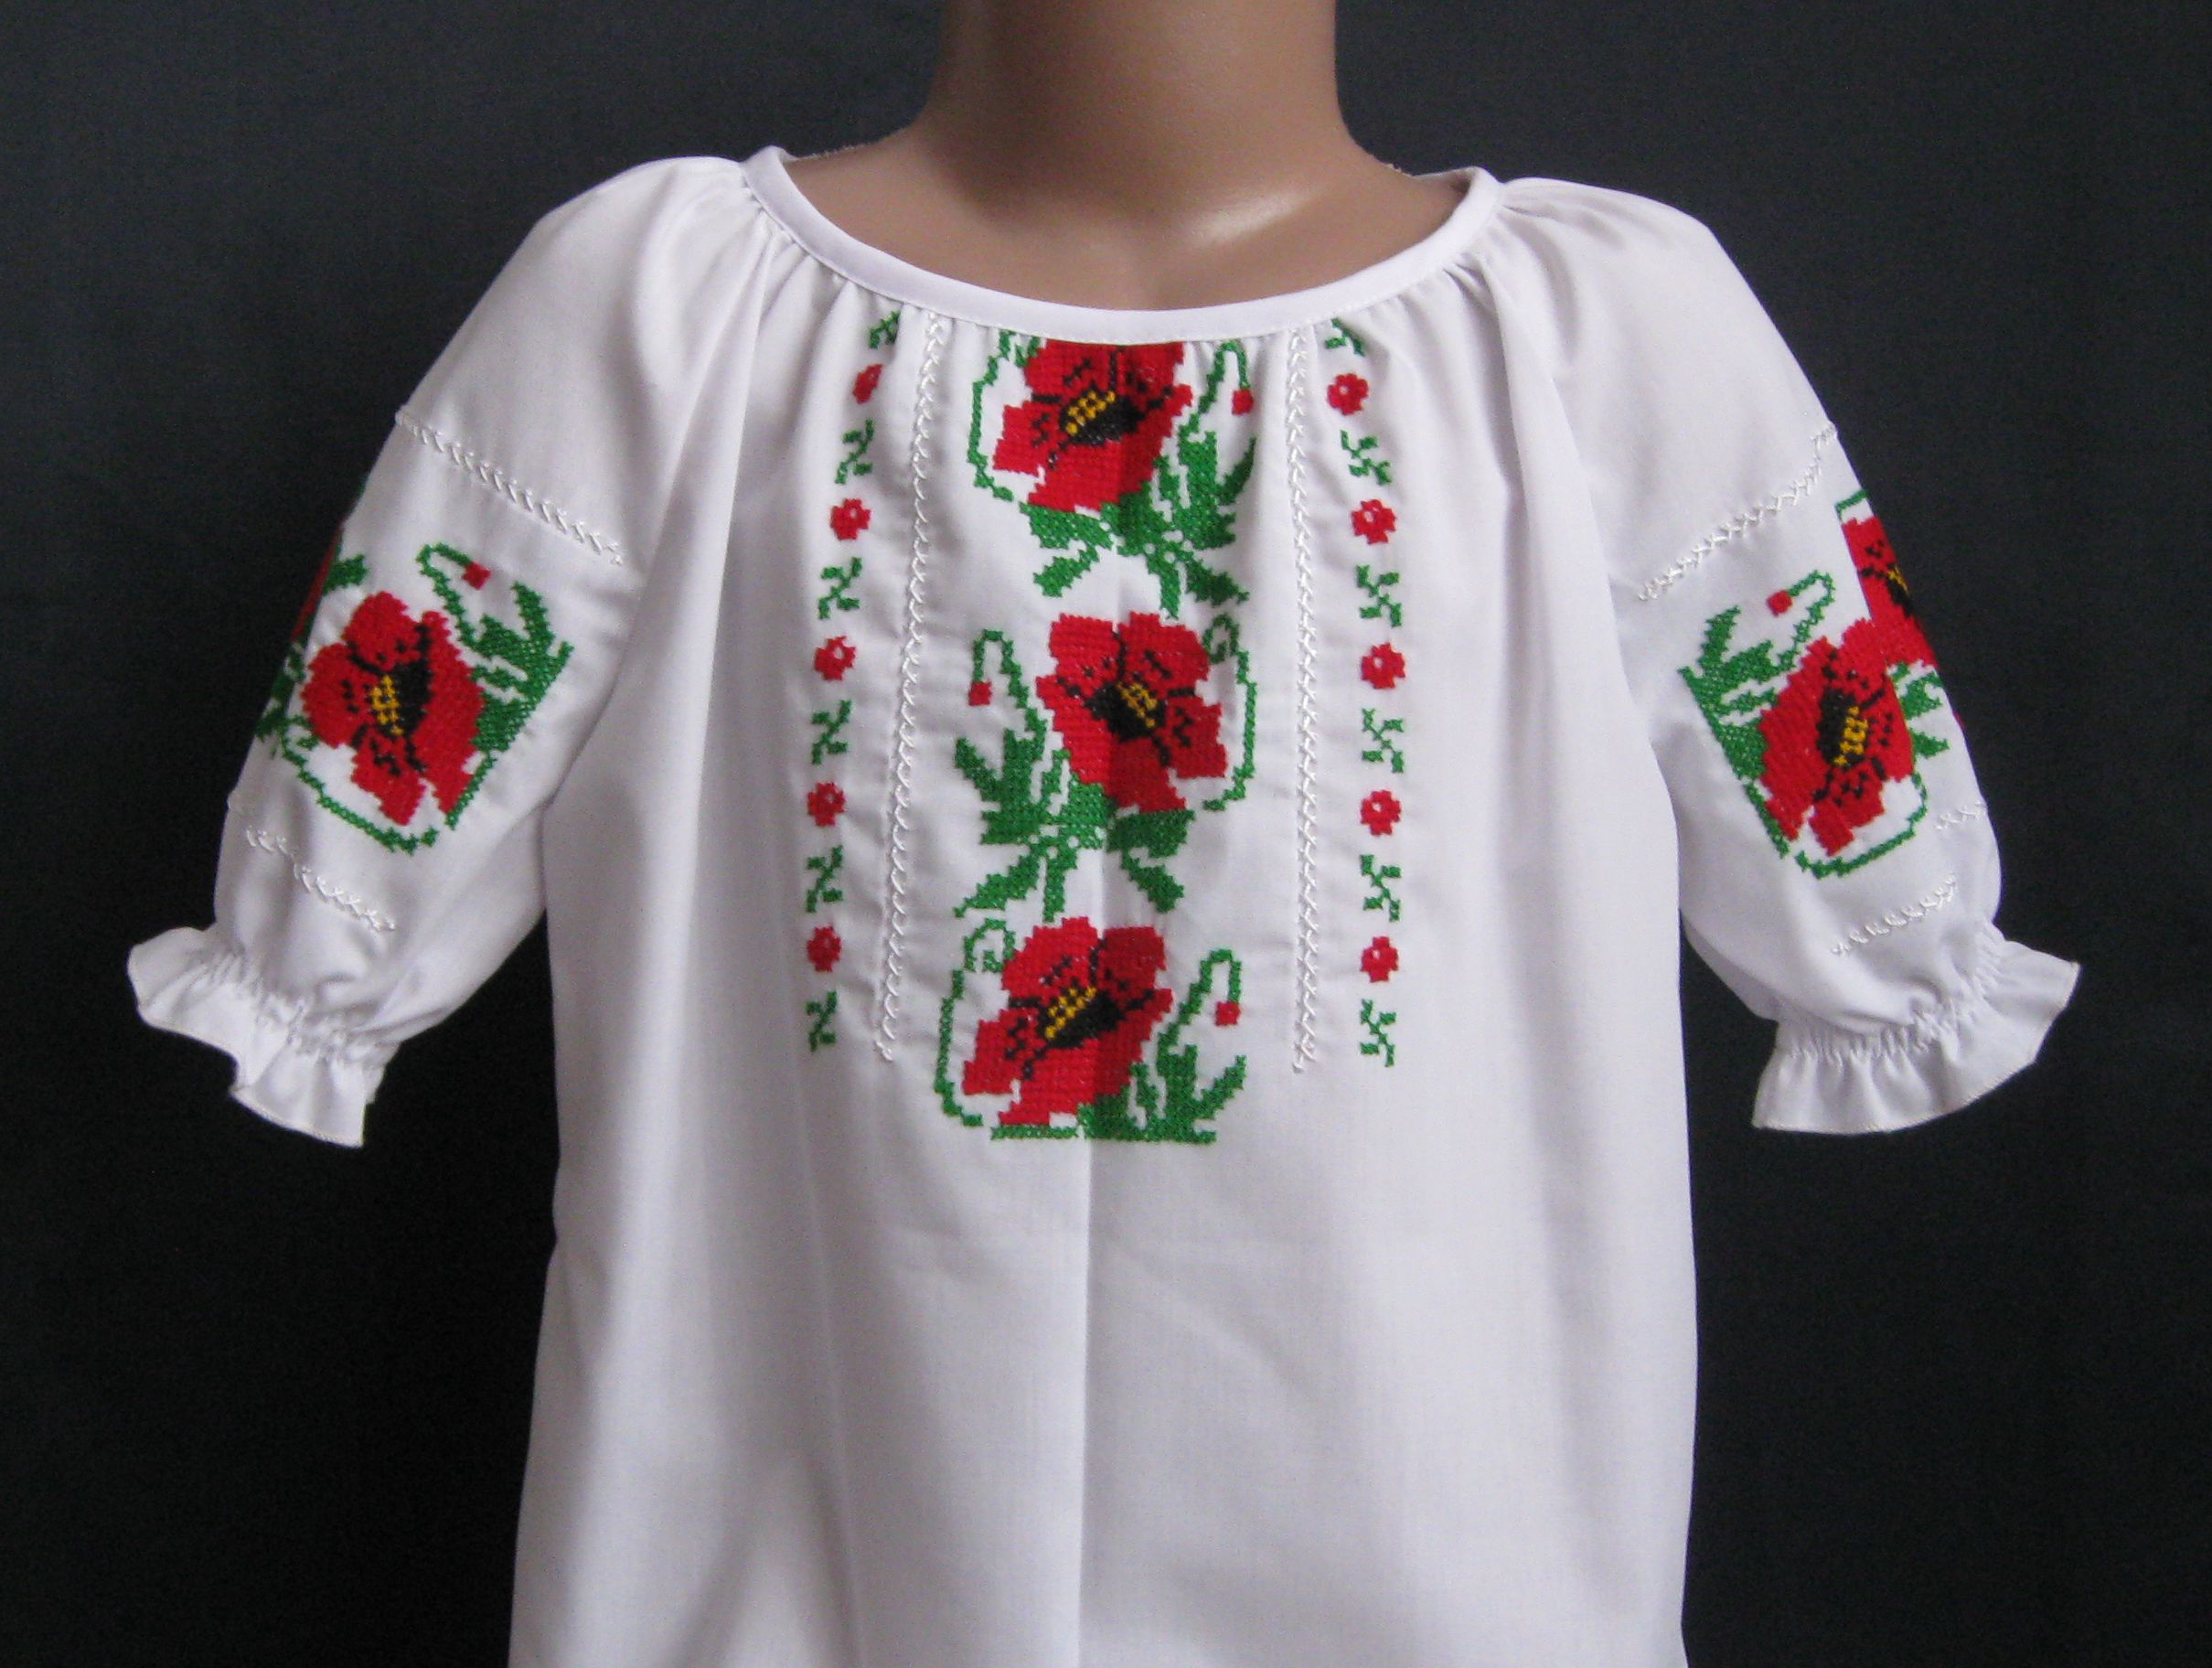 вышиванка для девочки с маками цена e75394556acd7